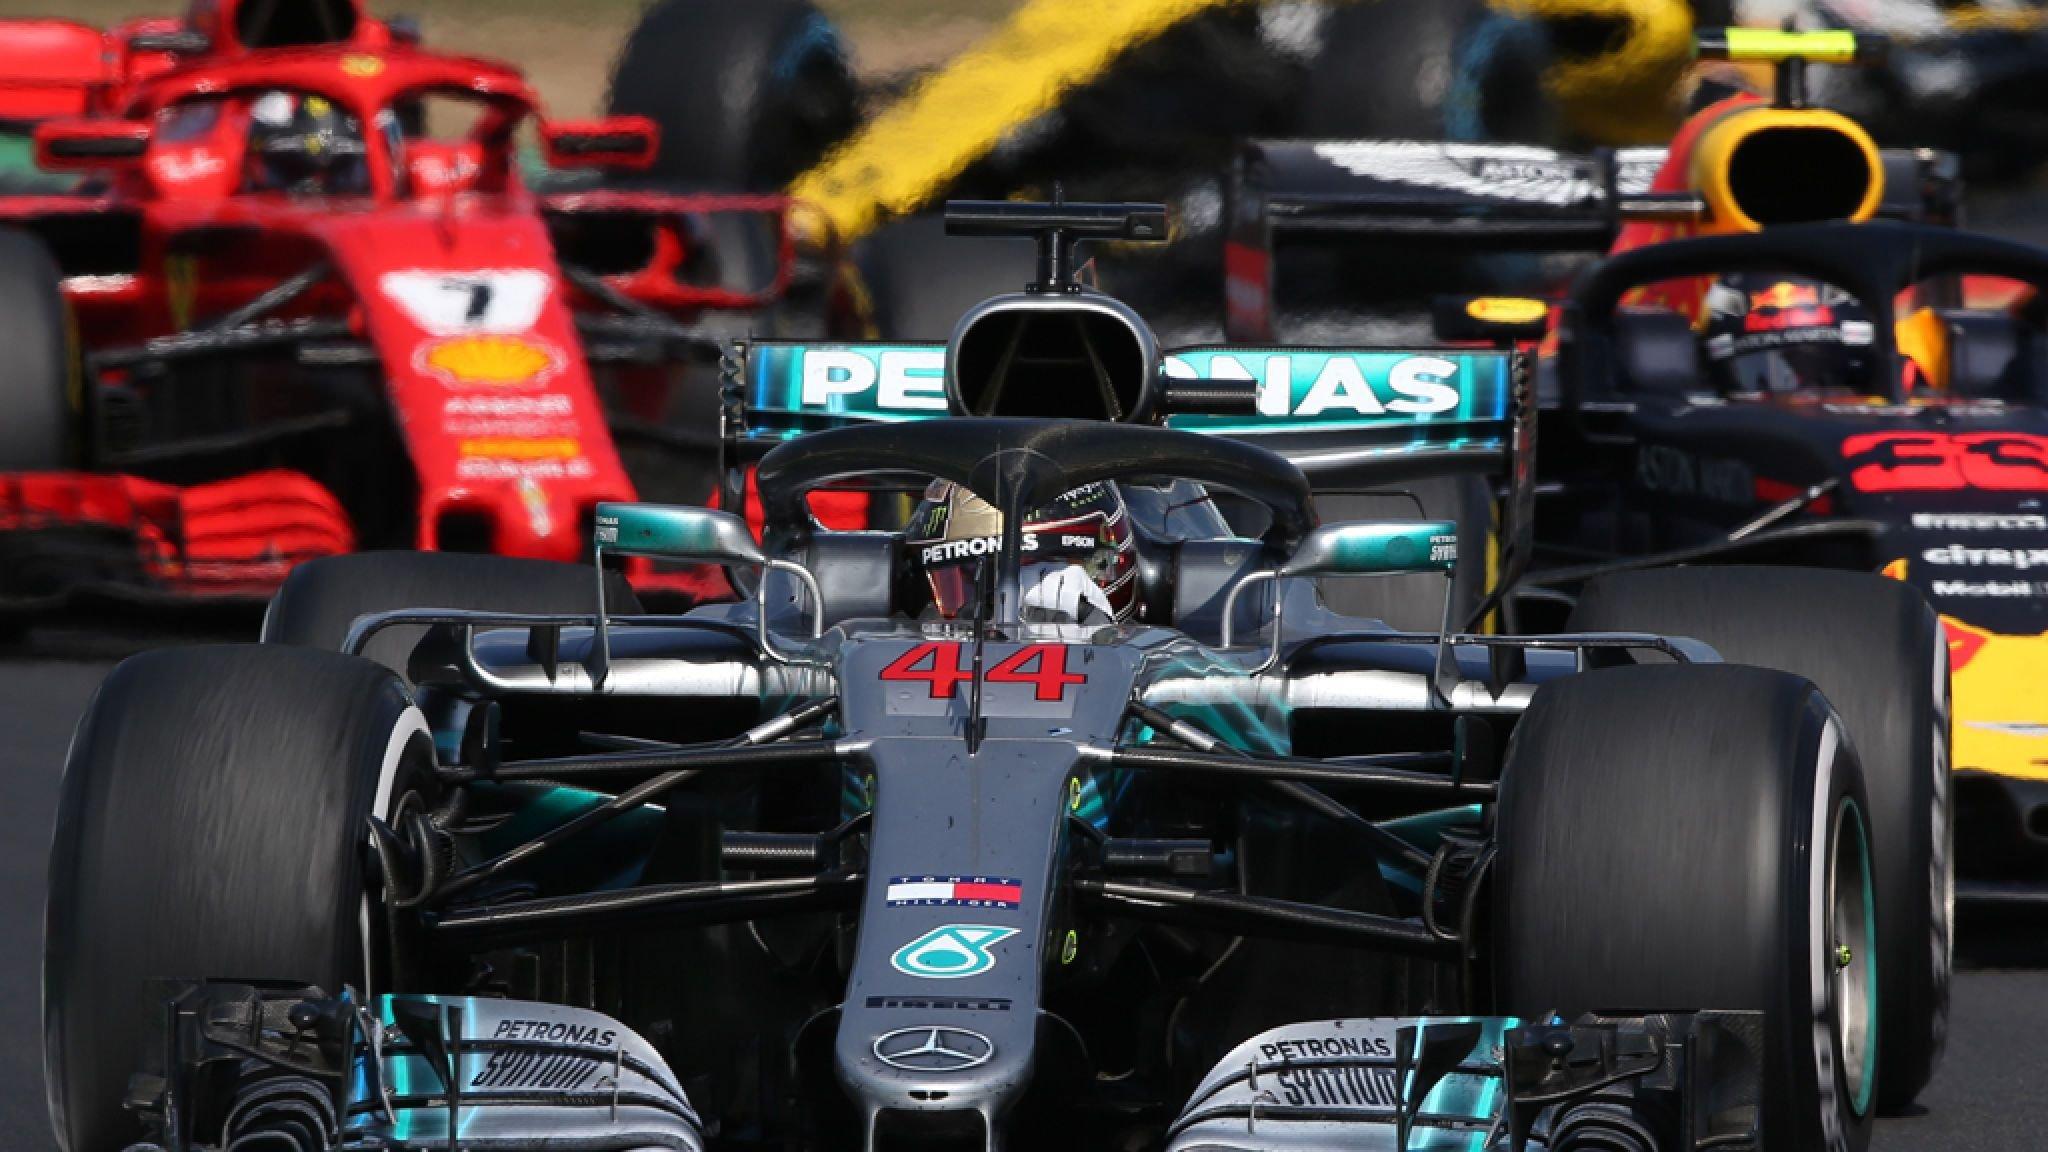 F1 2019 Schedule: 21 Race Calendar And December Finish   F1 News F1 Calendar 2019 Channel 4